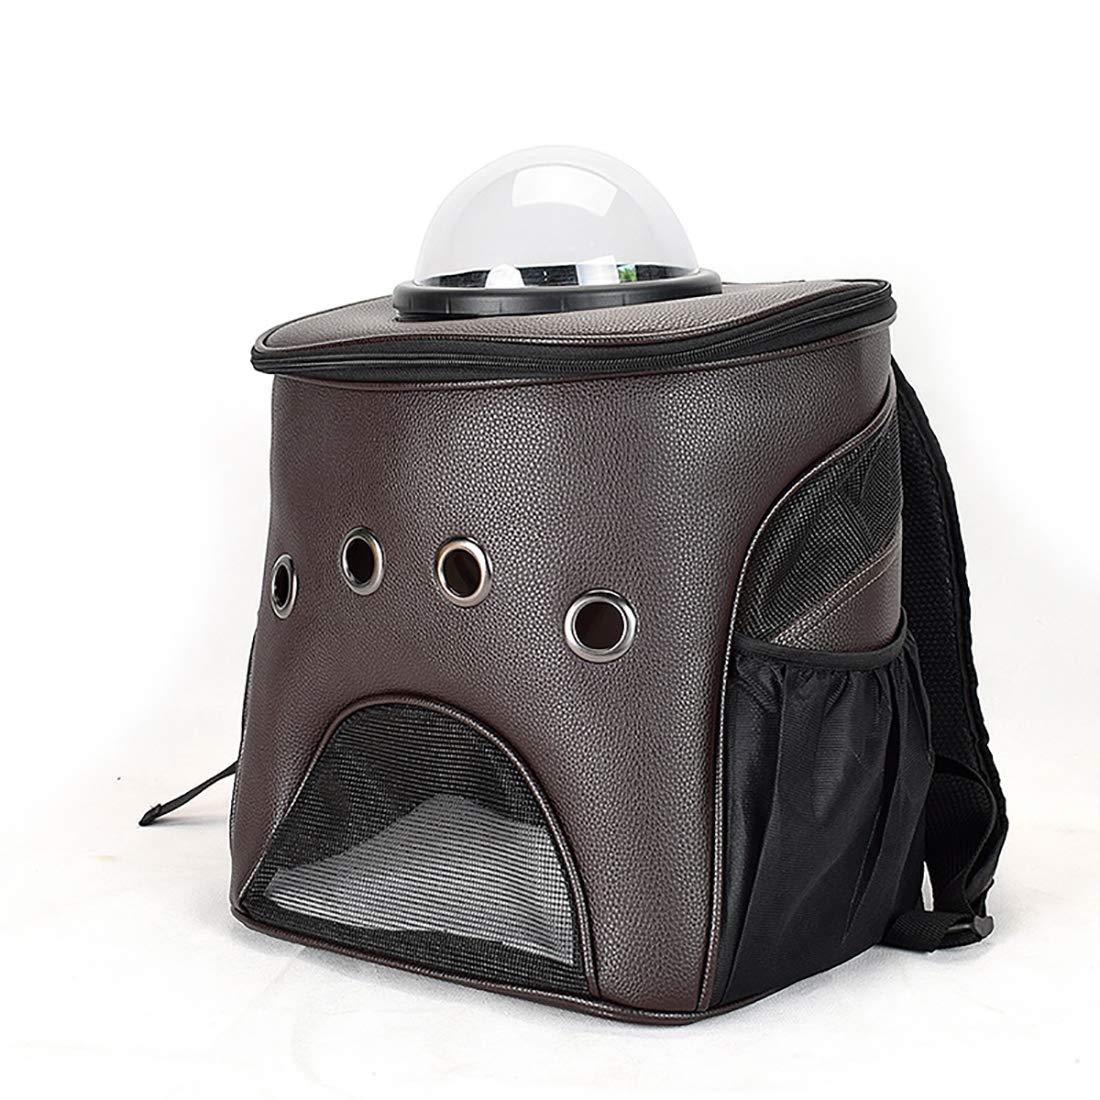 Black Pet Supplies Pet Bag Space Capsule pet Bag Multifunctional Folding pet Bag Car pet Bag Pet Bag Breathable 33.5  26.5  36.5 cm